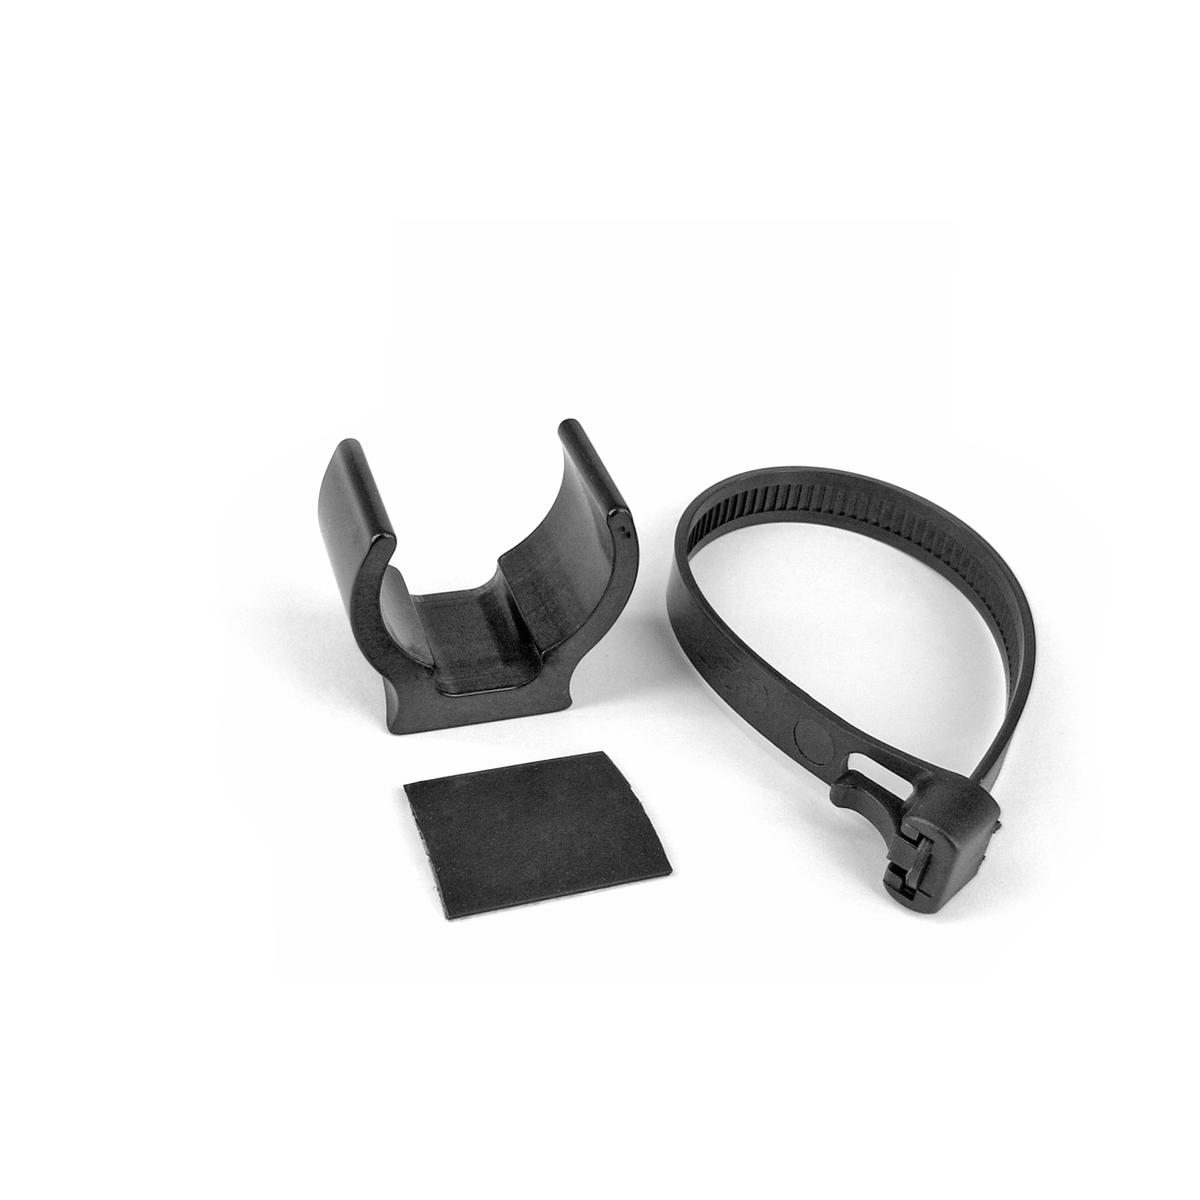 Kit fixation guidon (ø25,4/ø31,8) pour joystick